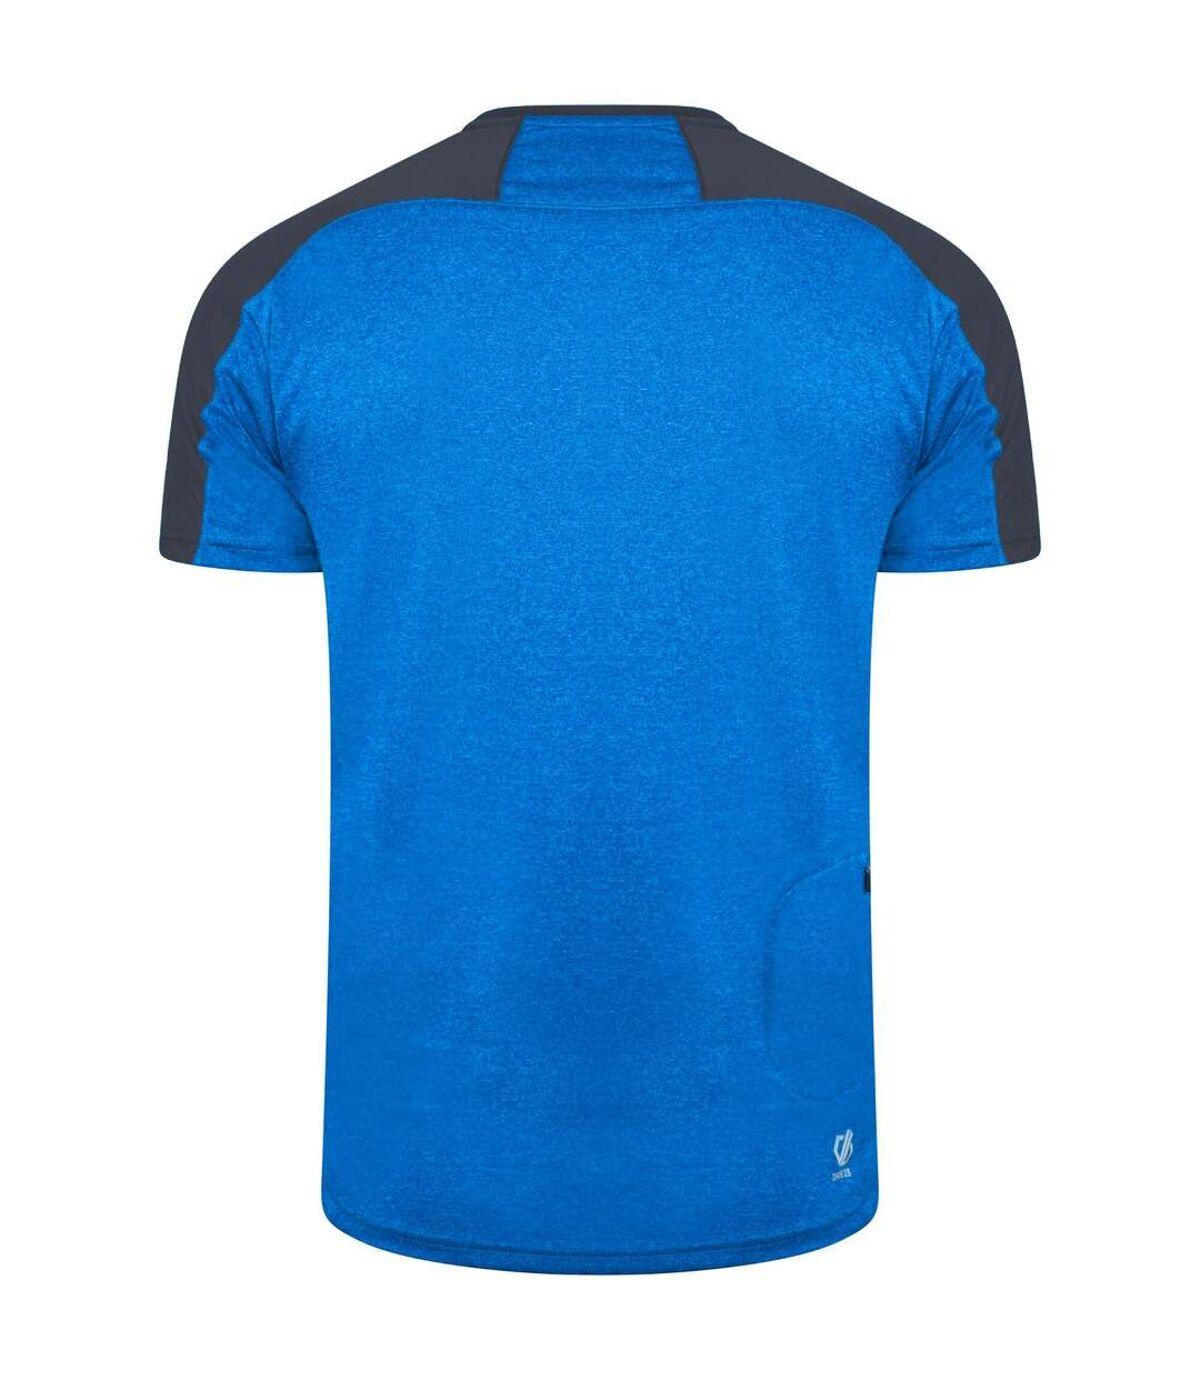 Dare 2B Mens Aces II Jersey (Petrol Blue/Methyl Blue) - UTRG5862